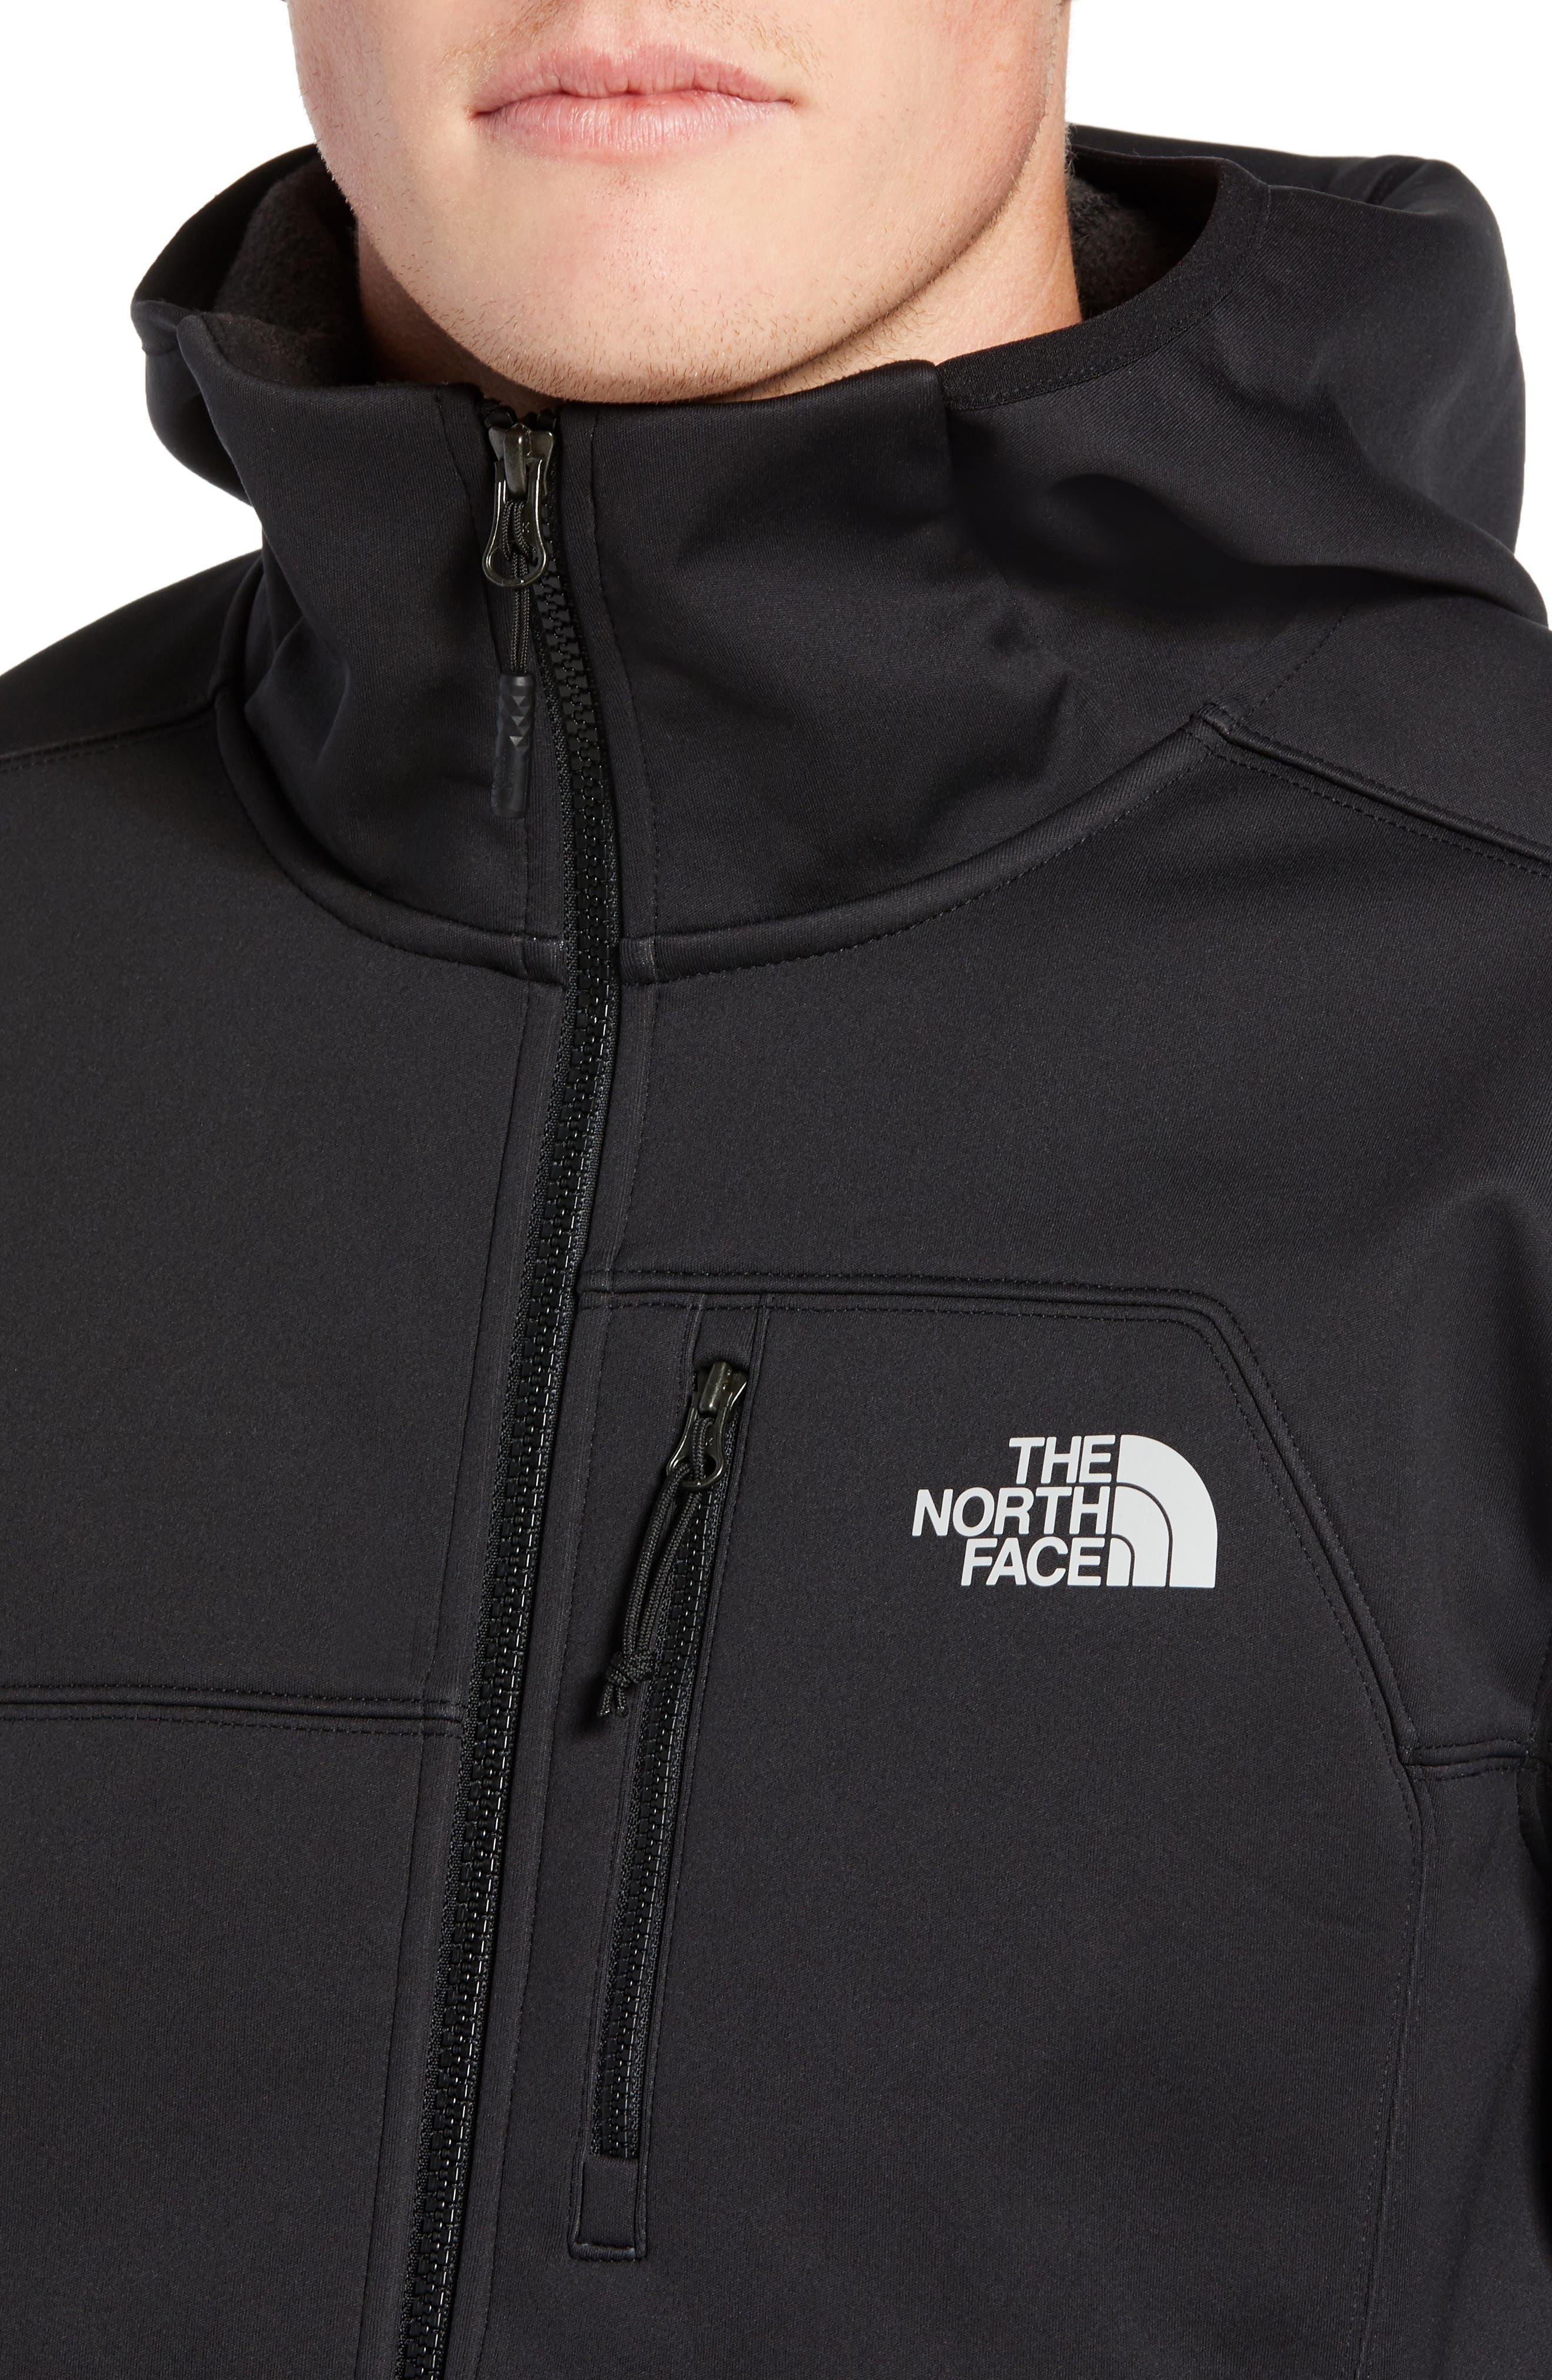 THE NORTH FACE,                             North Face Apex Risor Hooded Jacket,                             Alternate thumbnail 5, color,                             TNF BLACK/ TNF BLACK